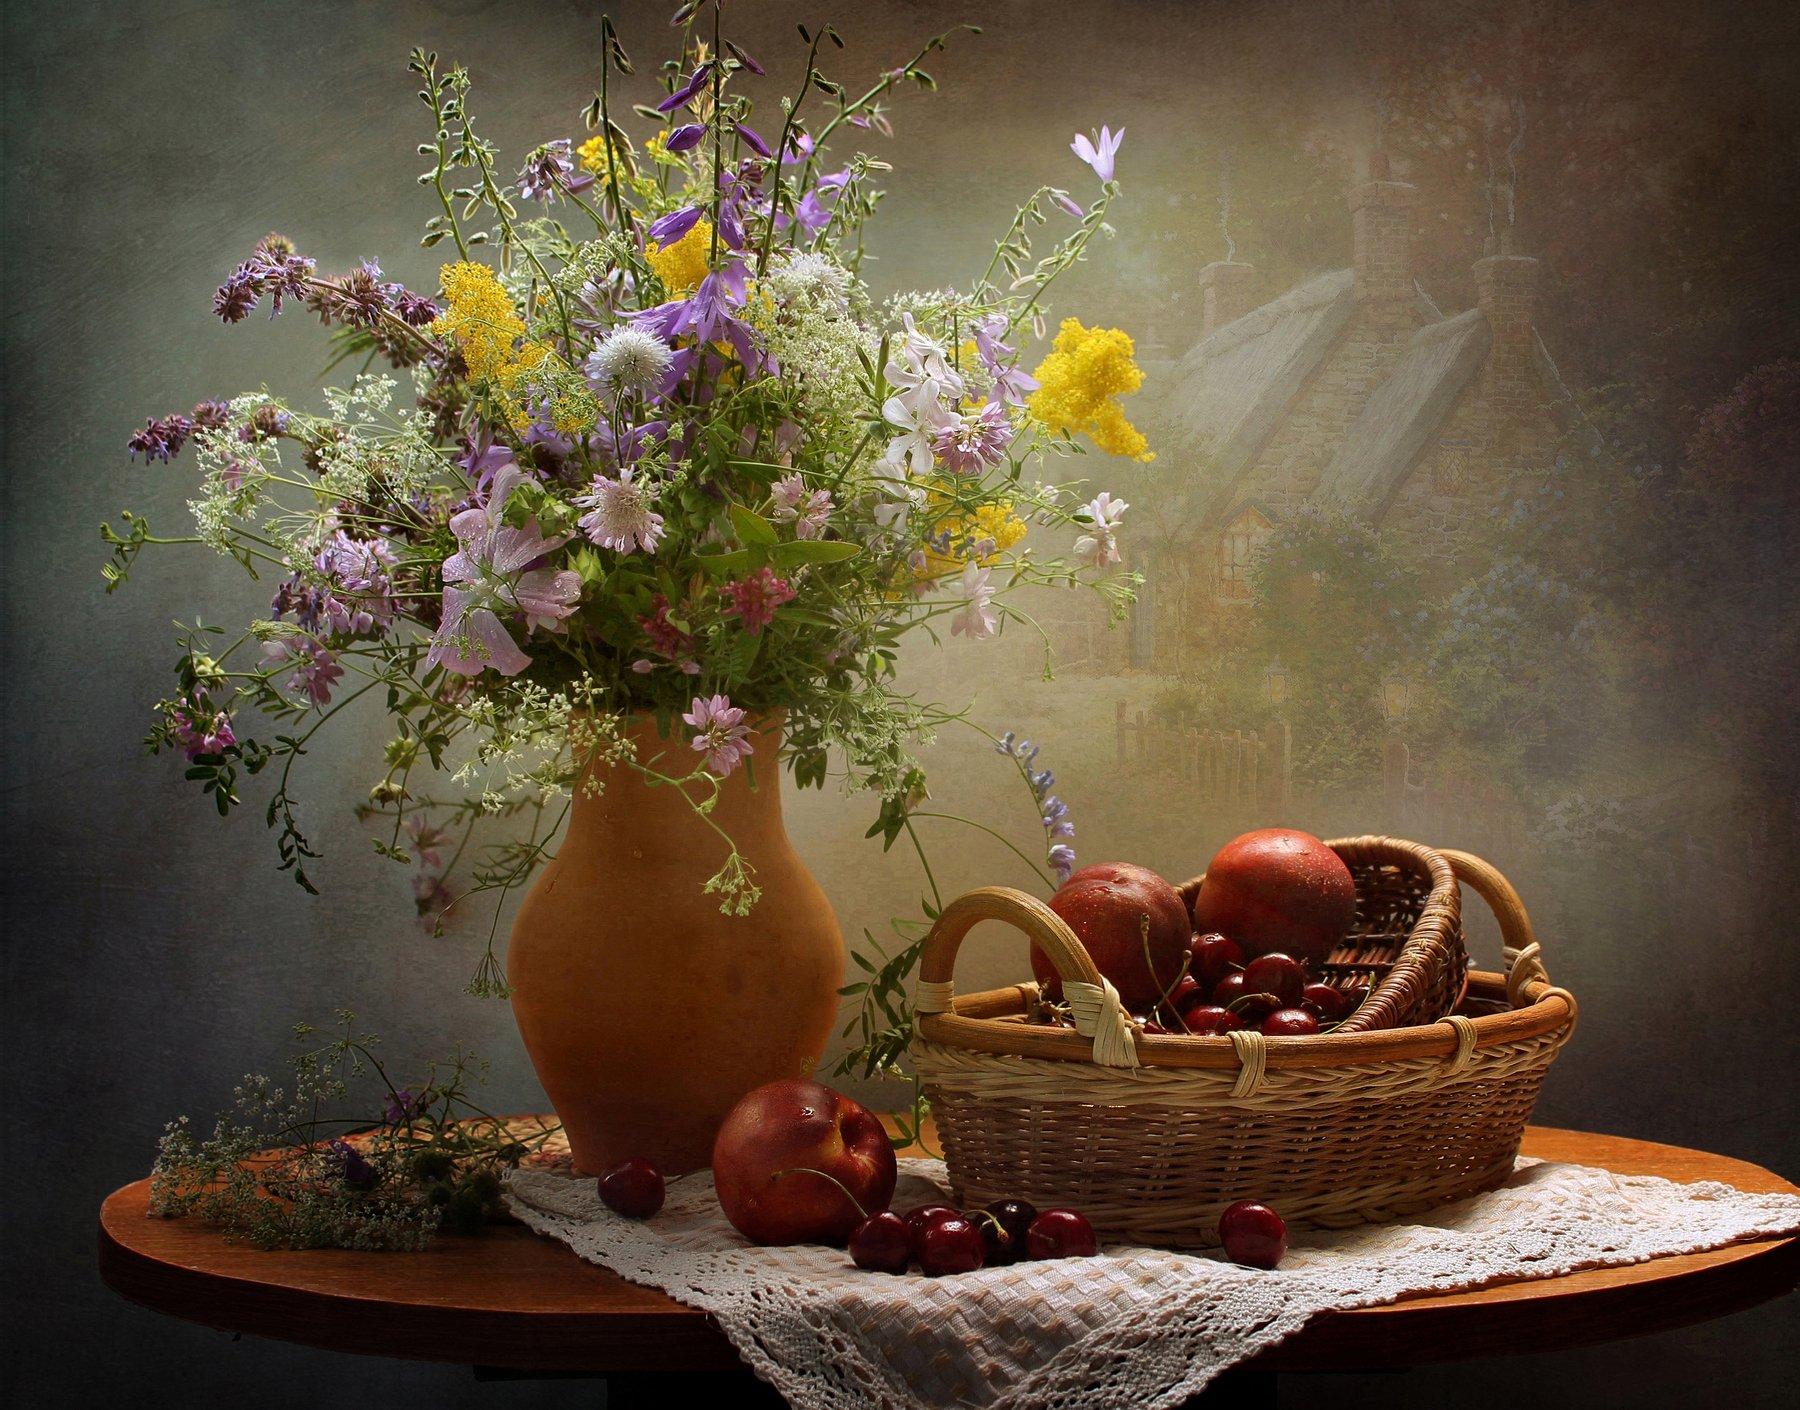 натюрморт, лето, цветы, фрукты, Ковалева Светлана